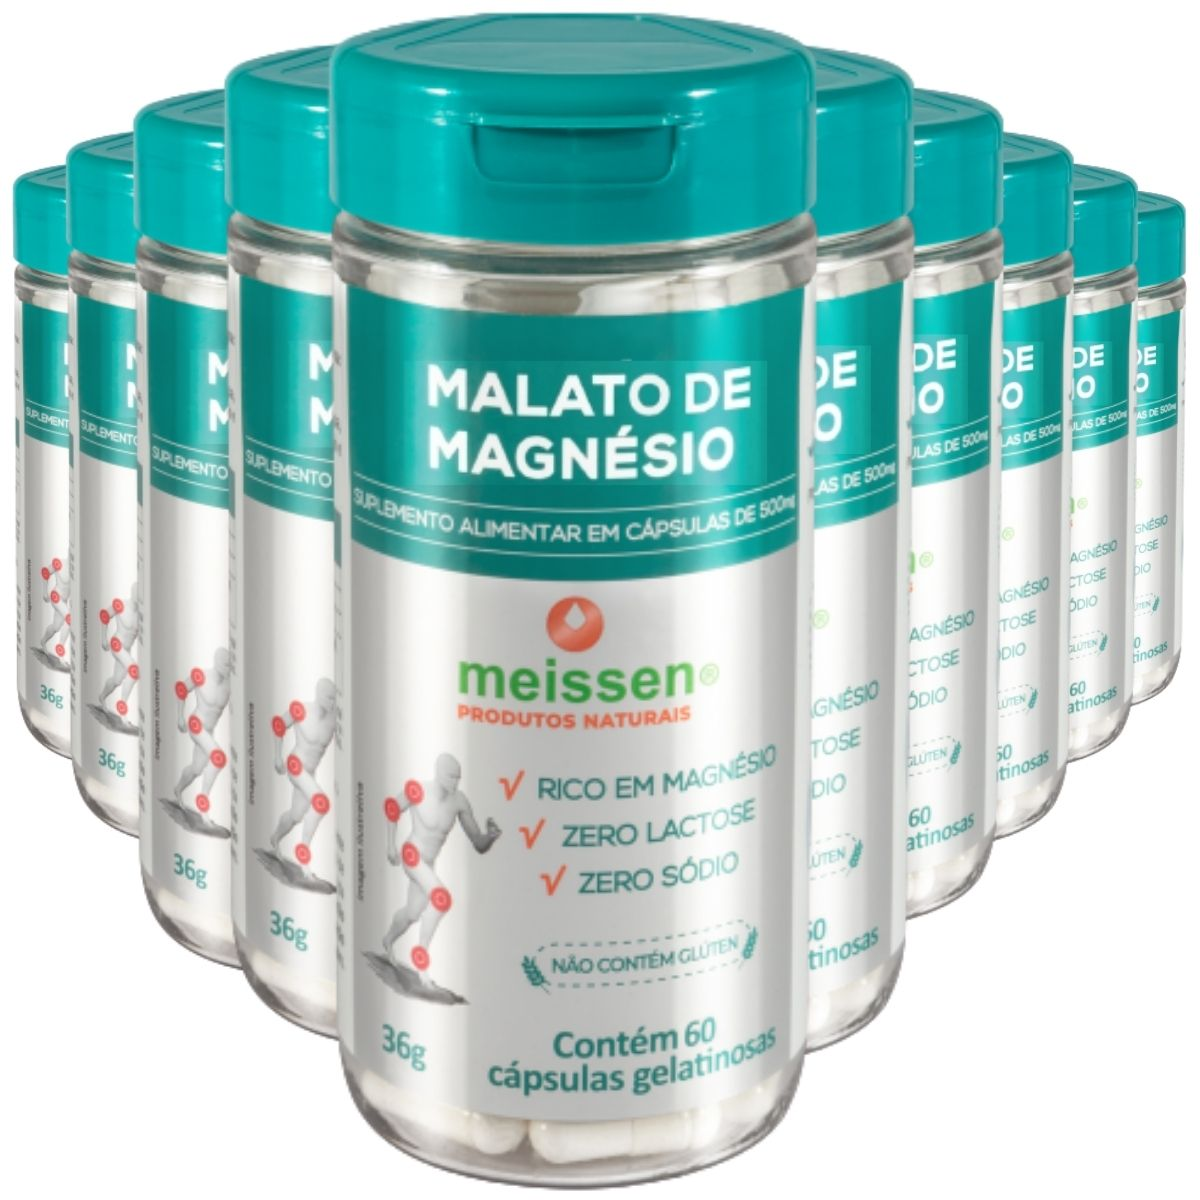 10x Malato de Magnésio (Magnésio Dimalato) 600 Cápsulas Total- Meissen